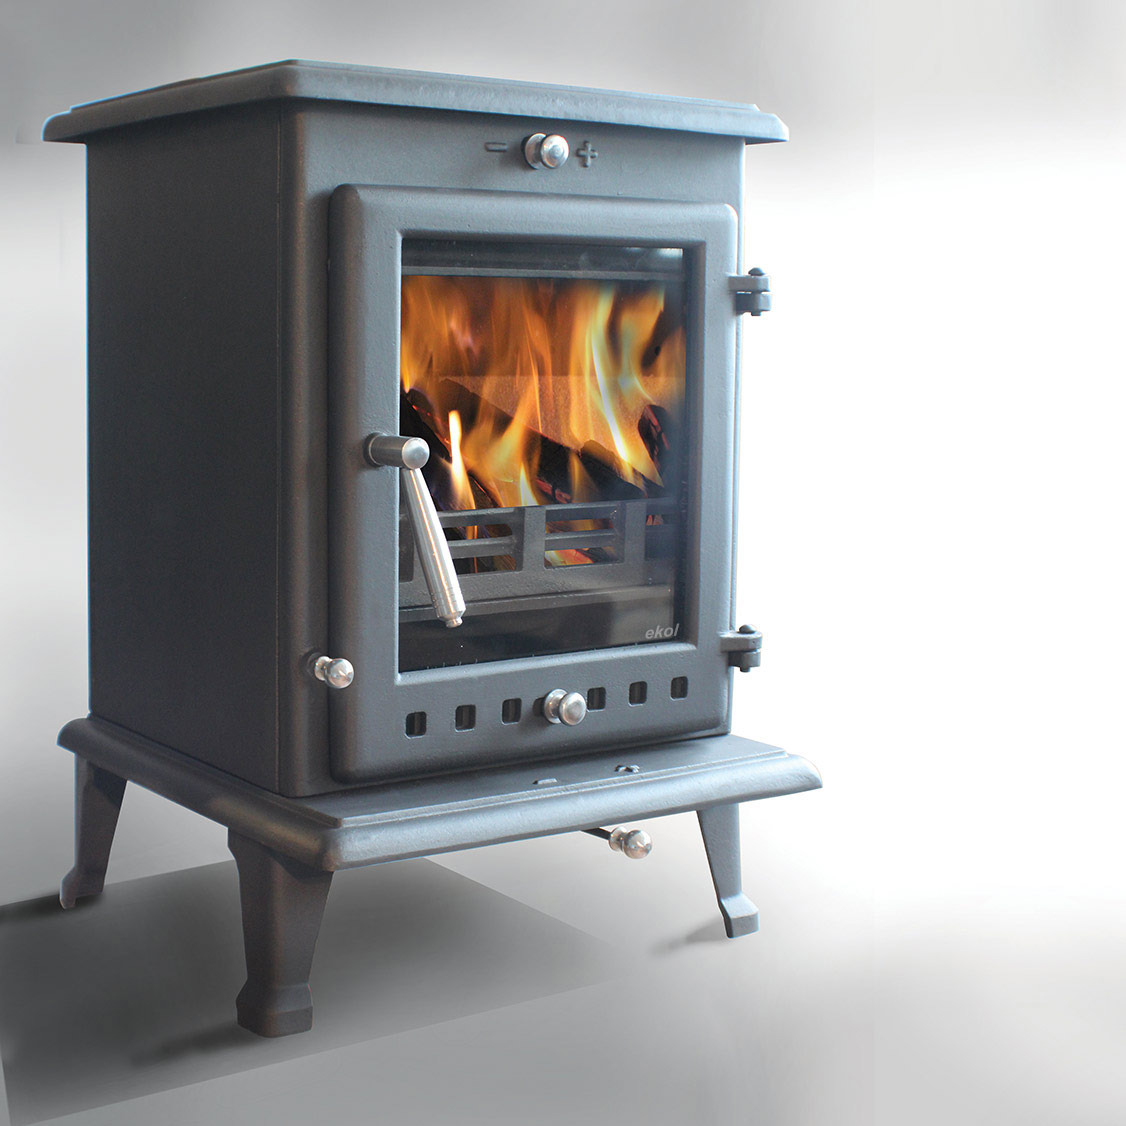 Ekol Crystal 8 Wood Burning Stove